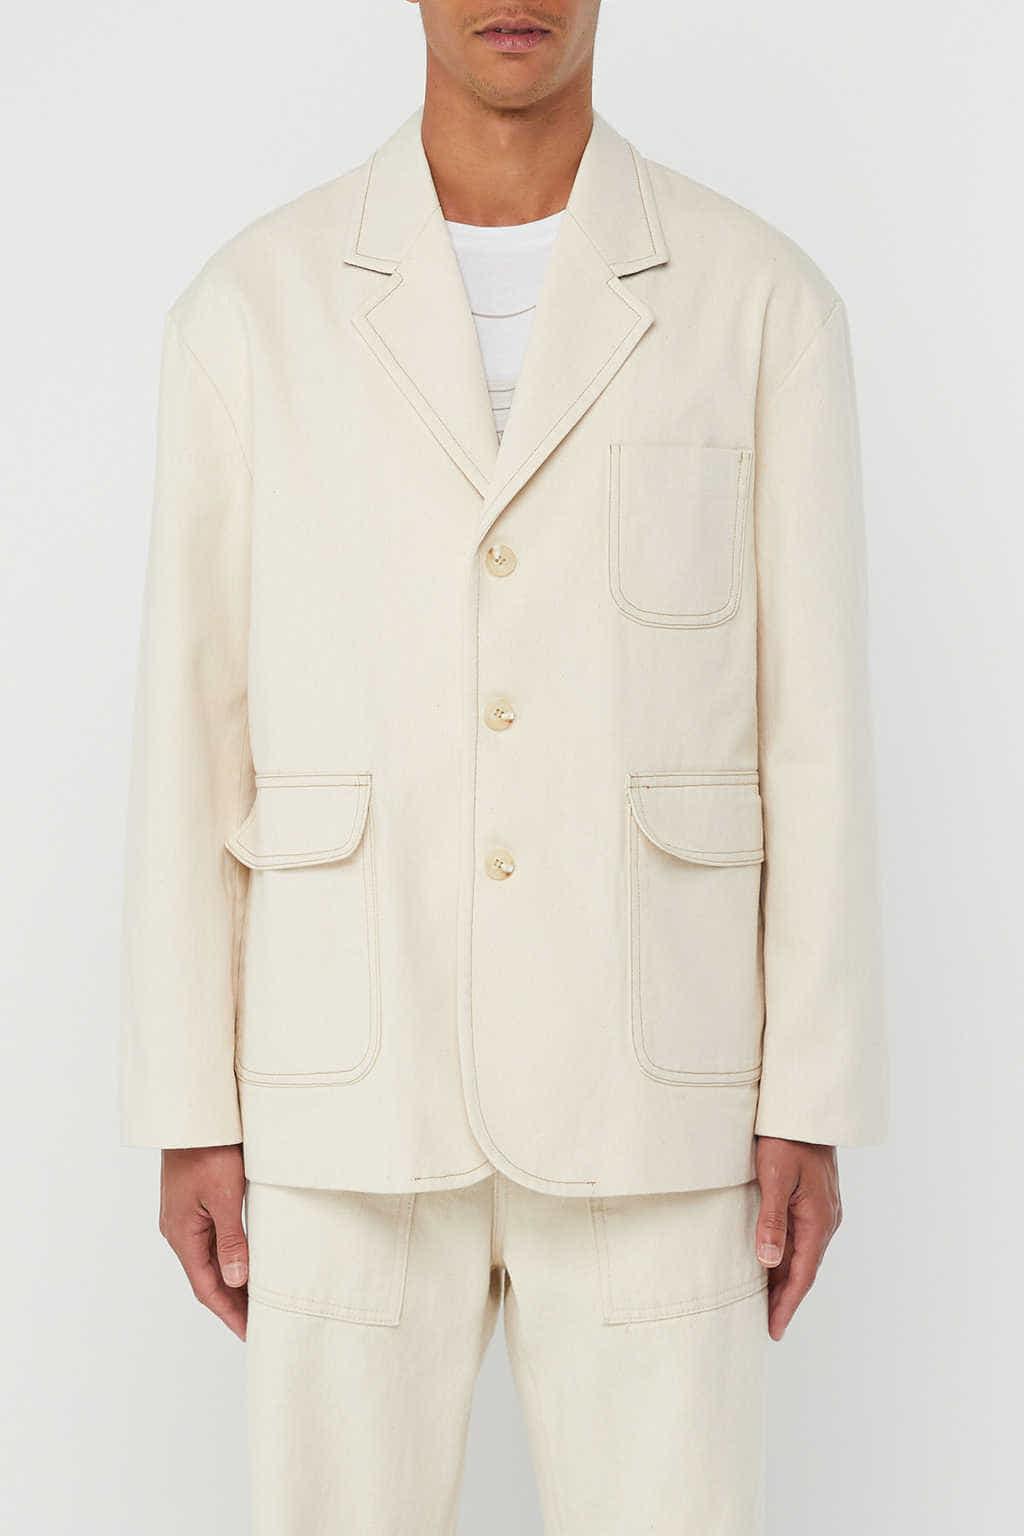 Jacket K002 Cream 3